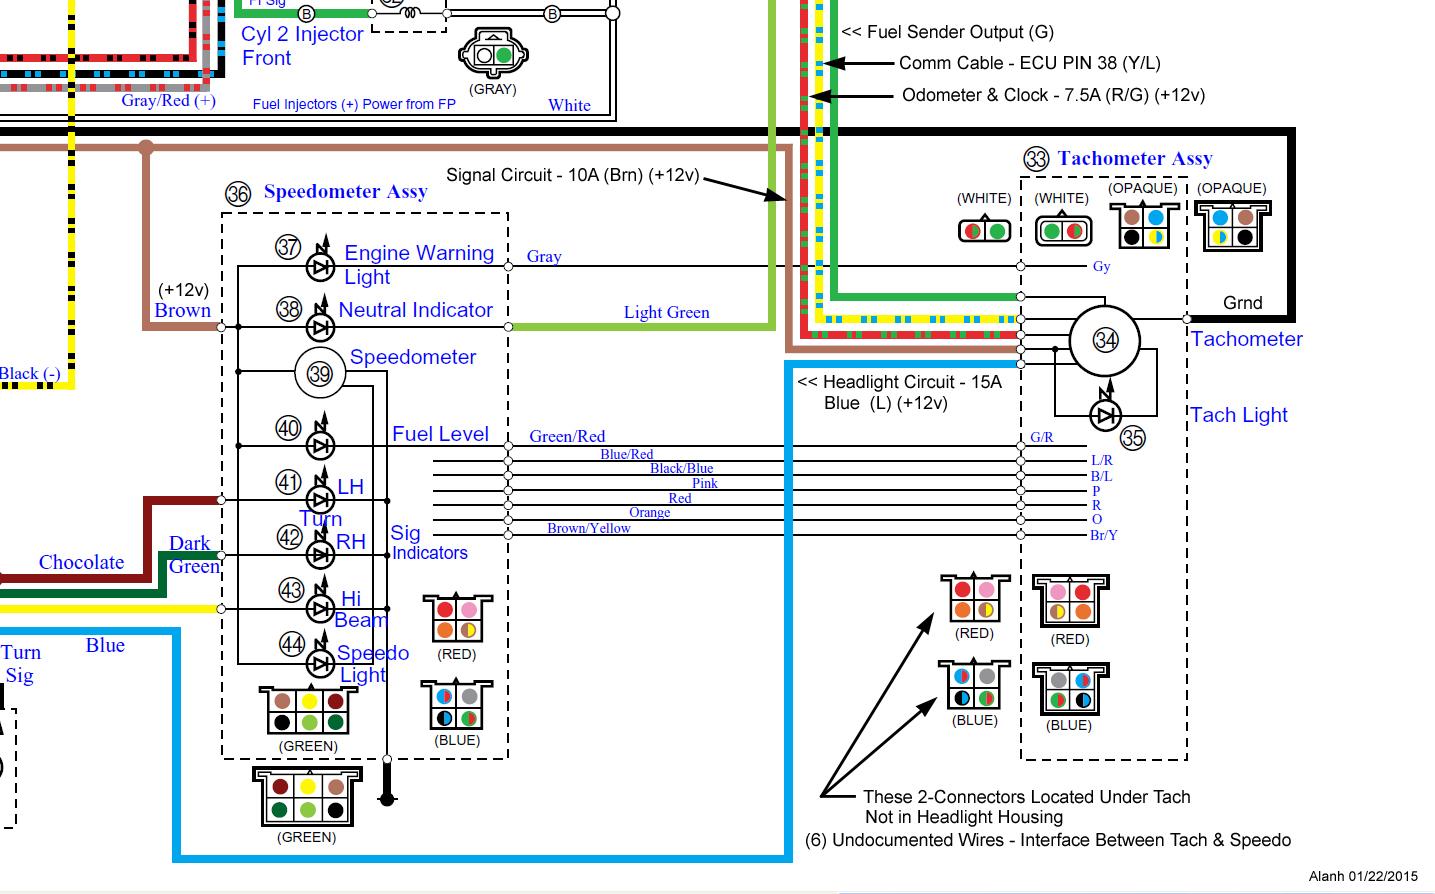 Roadstar Wiring Diagram Wiring Diagram For 2004 Isuzu Axiom Mazda3 Sp23 2014ok Jeanjaures37 Fr